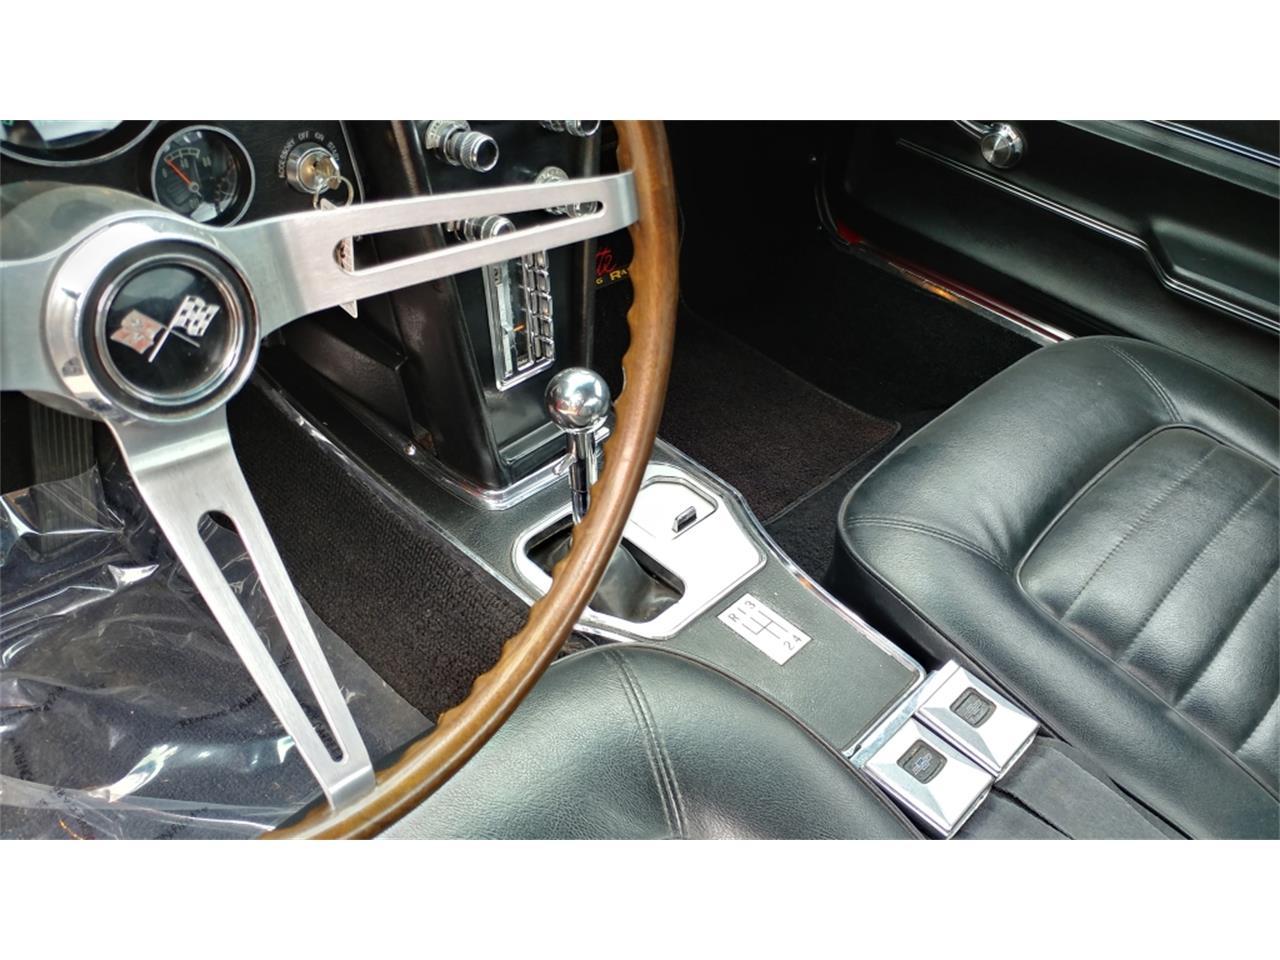 Large Picture of Classic '66 Corvette located in Missouri - $59,995.00 - MO25